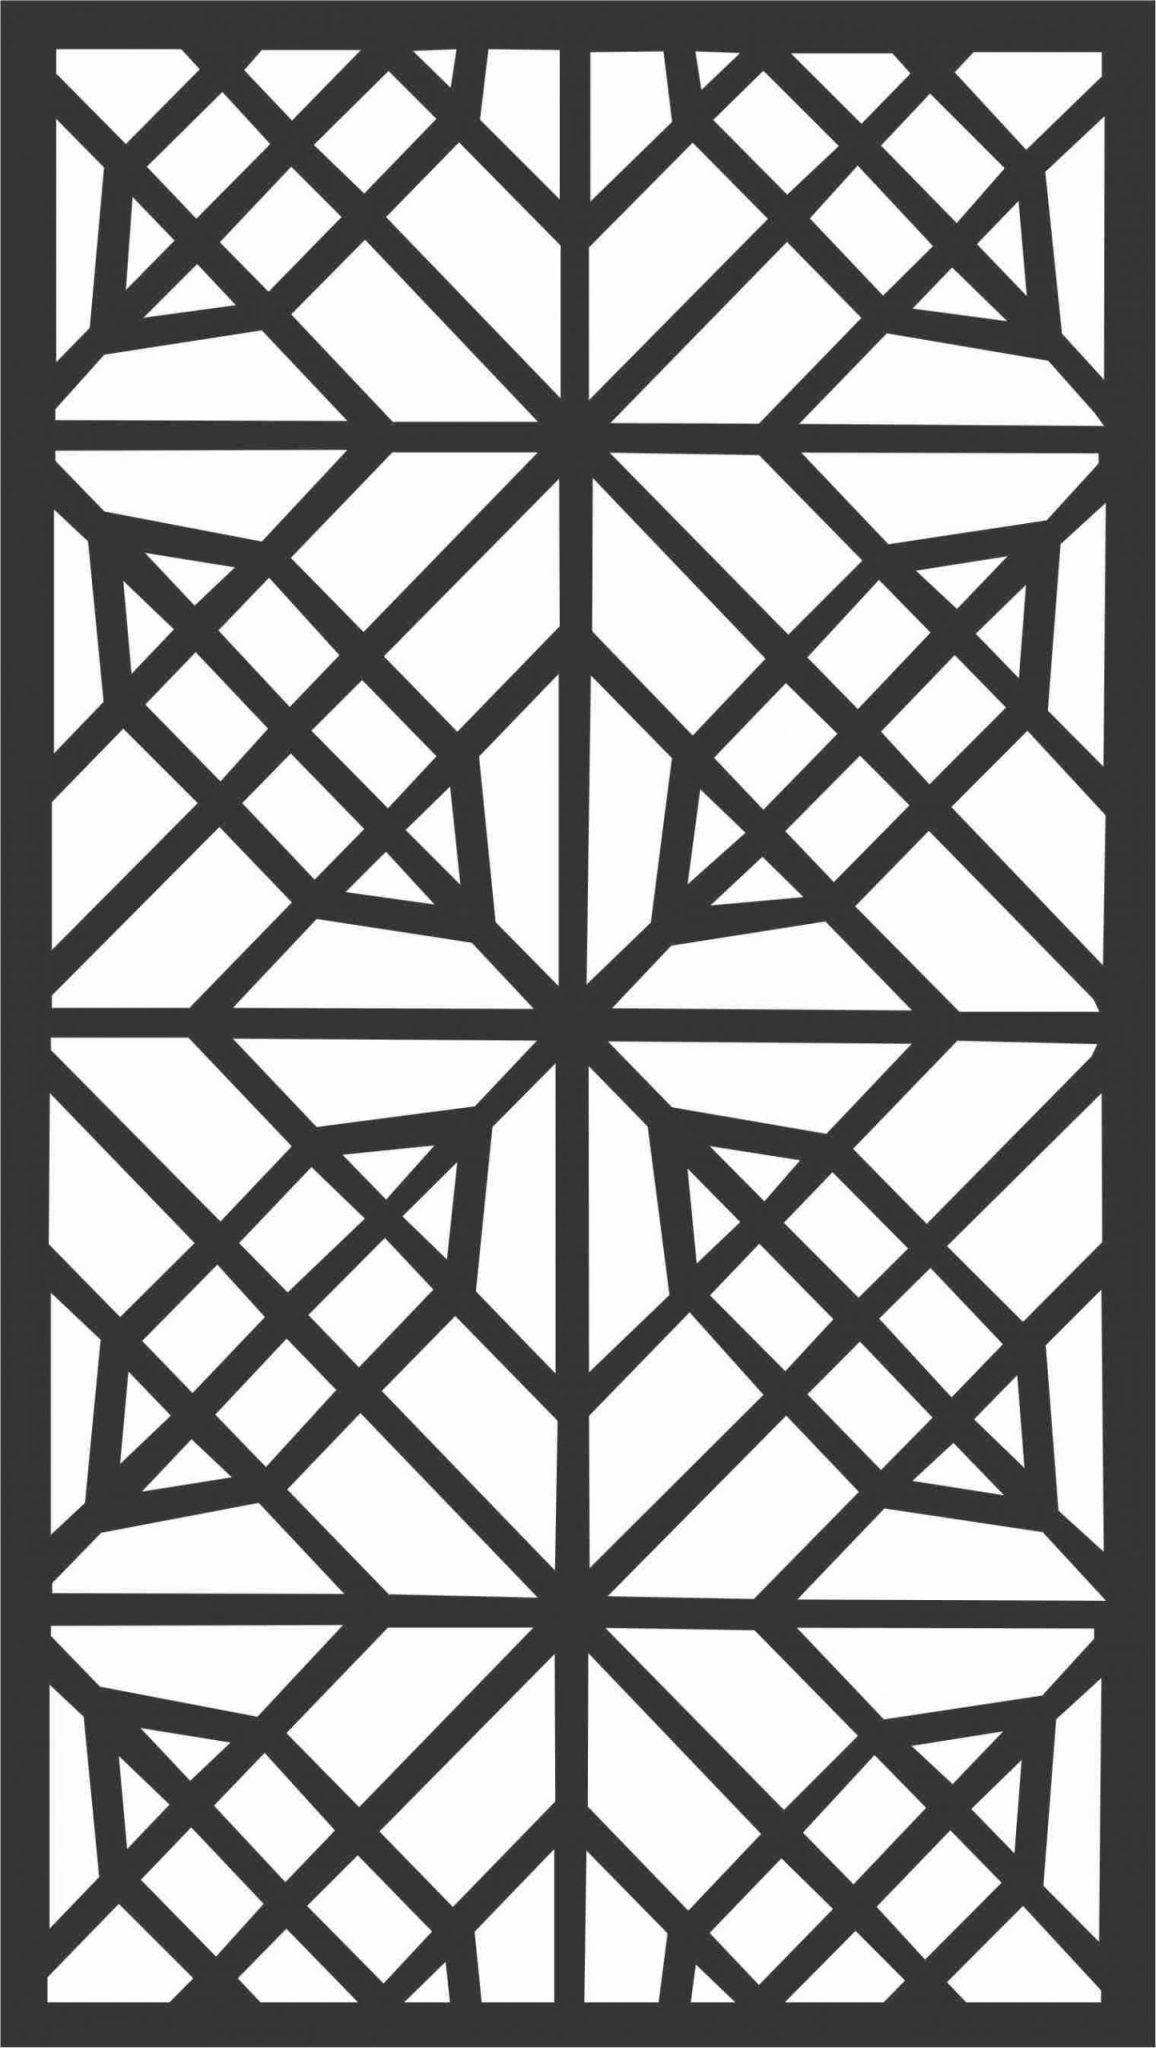 Screen Panel Patterns Seamless 23 Free DXF File